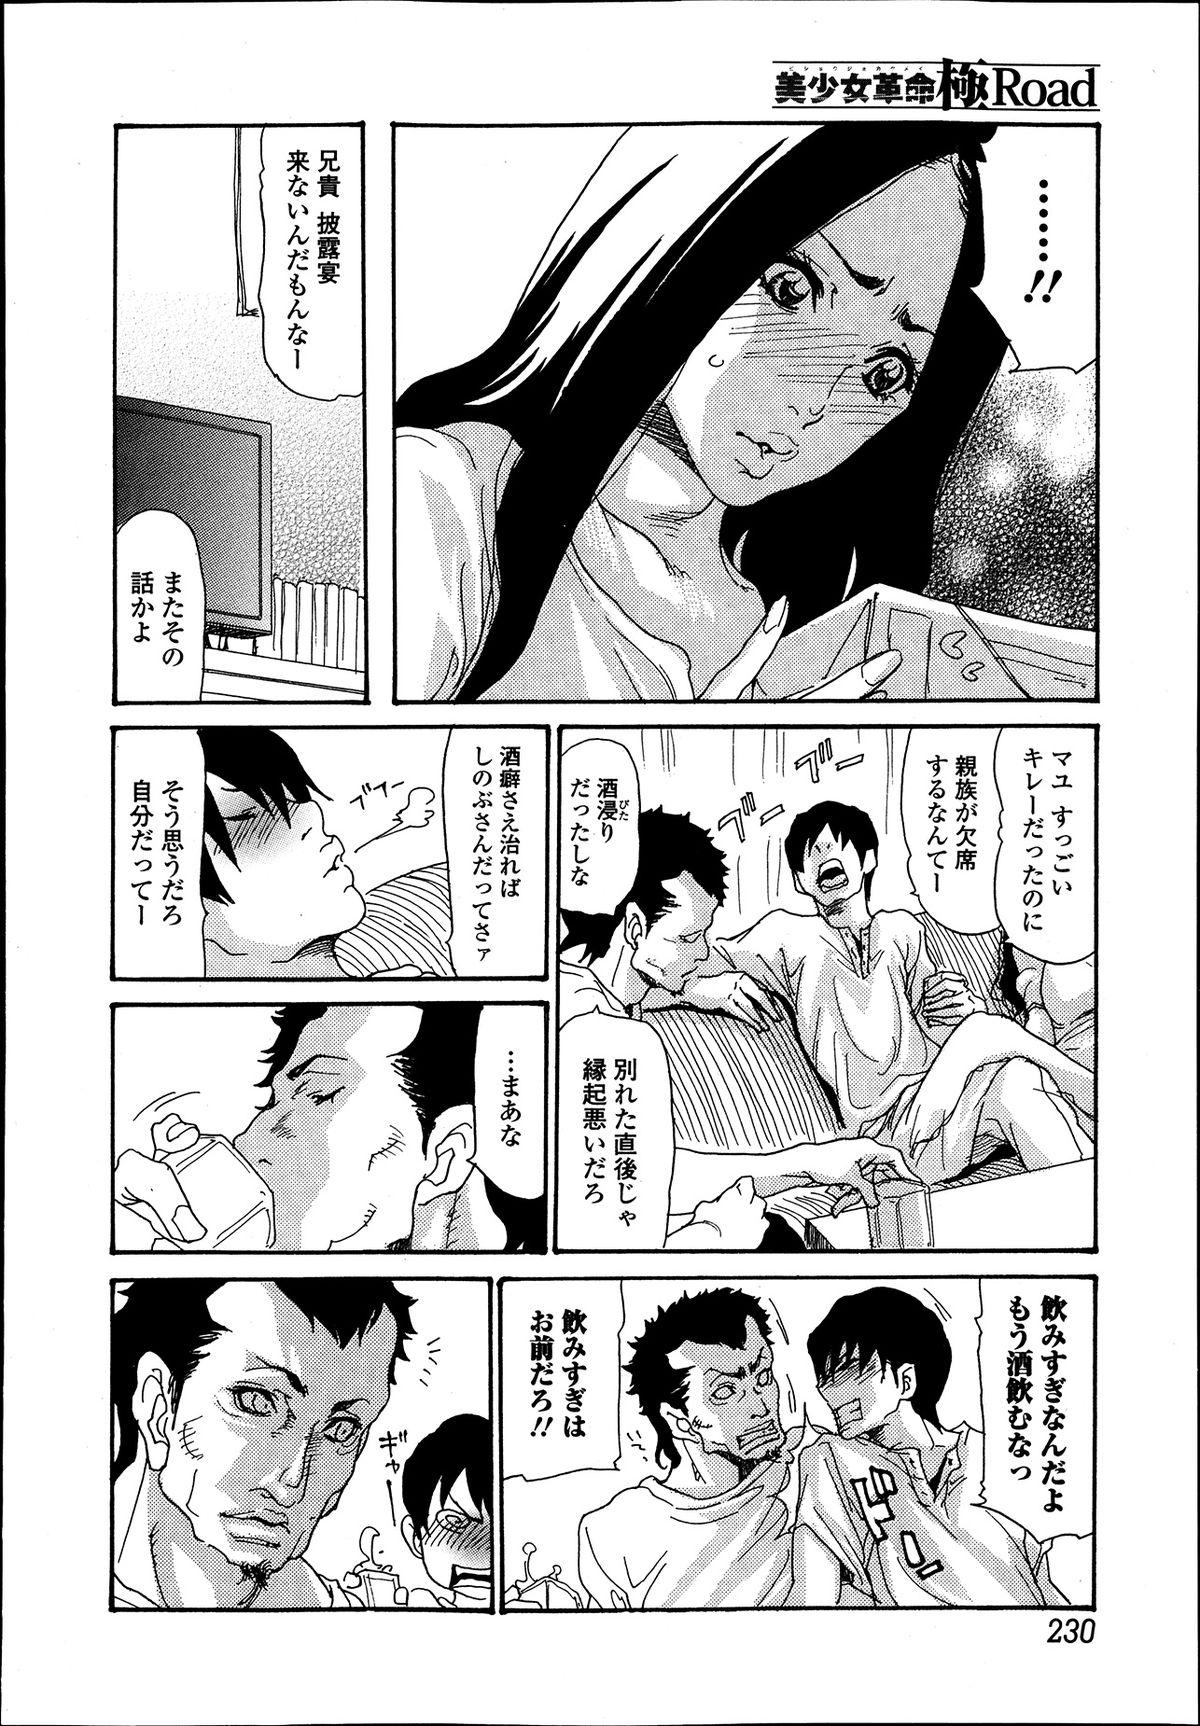 Bishoujo Kakumei KIWAME Road Vol.9 229